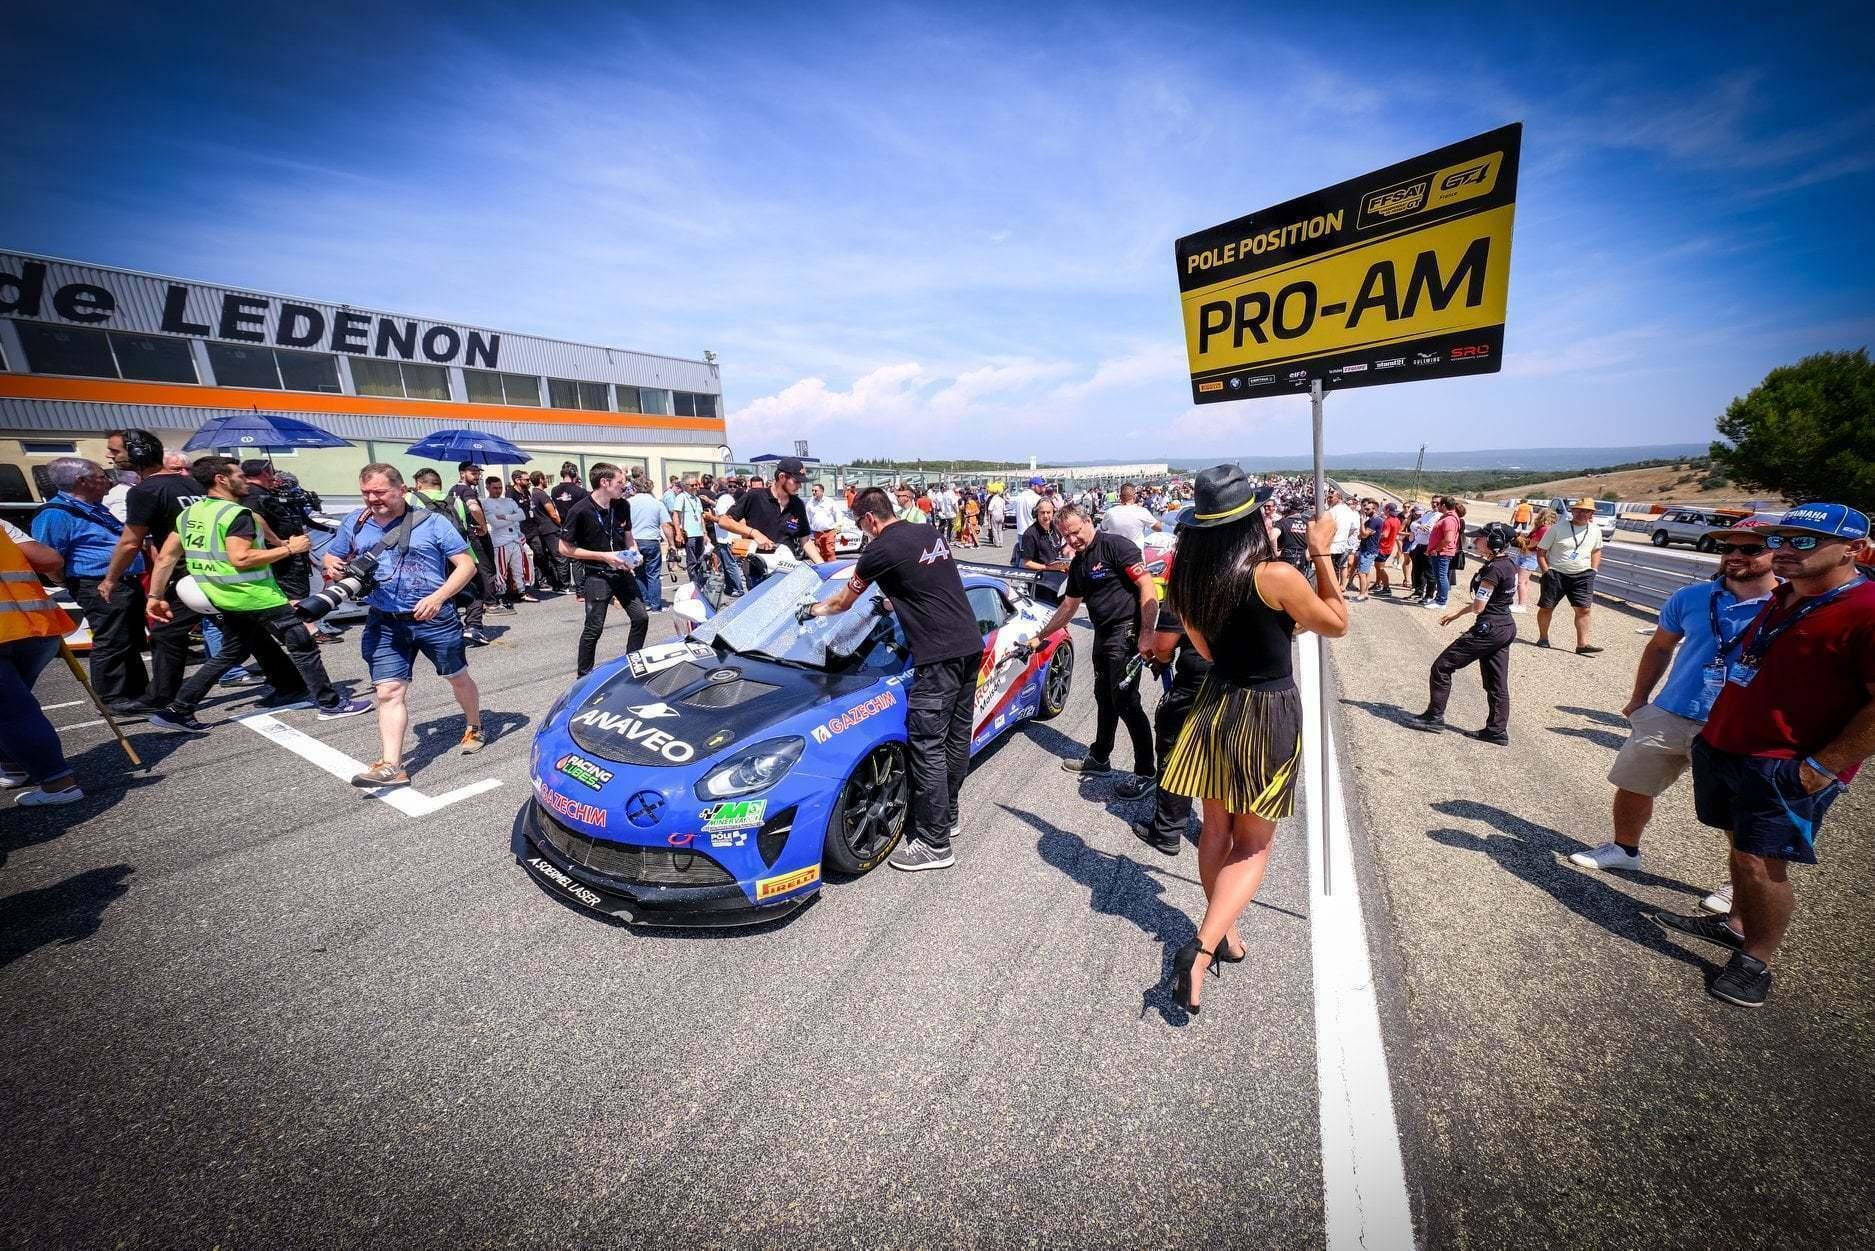 FFSA GT: CMR reprend la main Lédenon ! (Course 2) 11